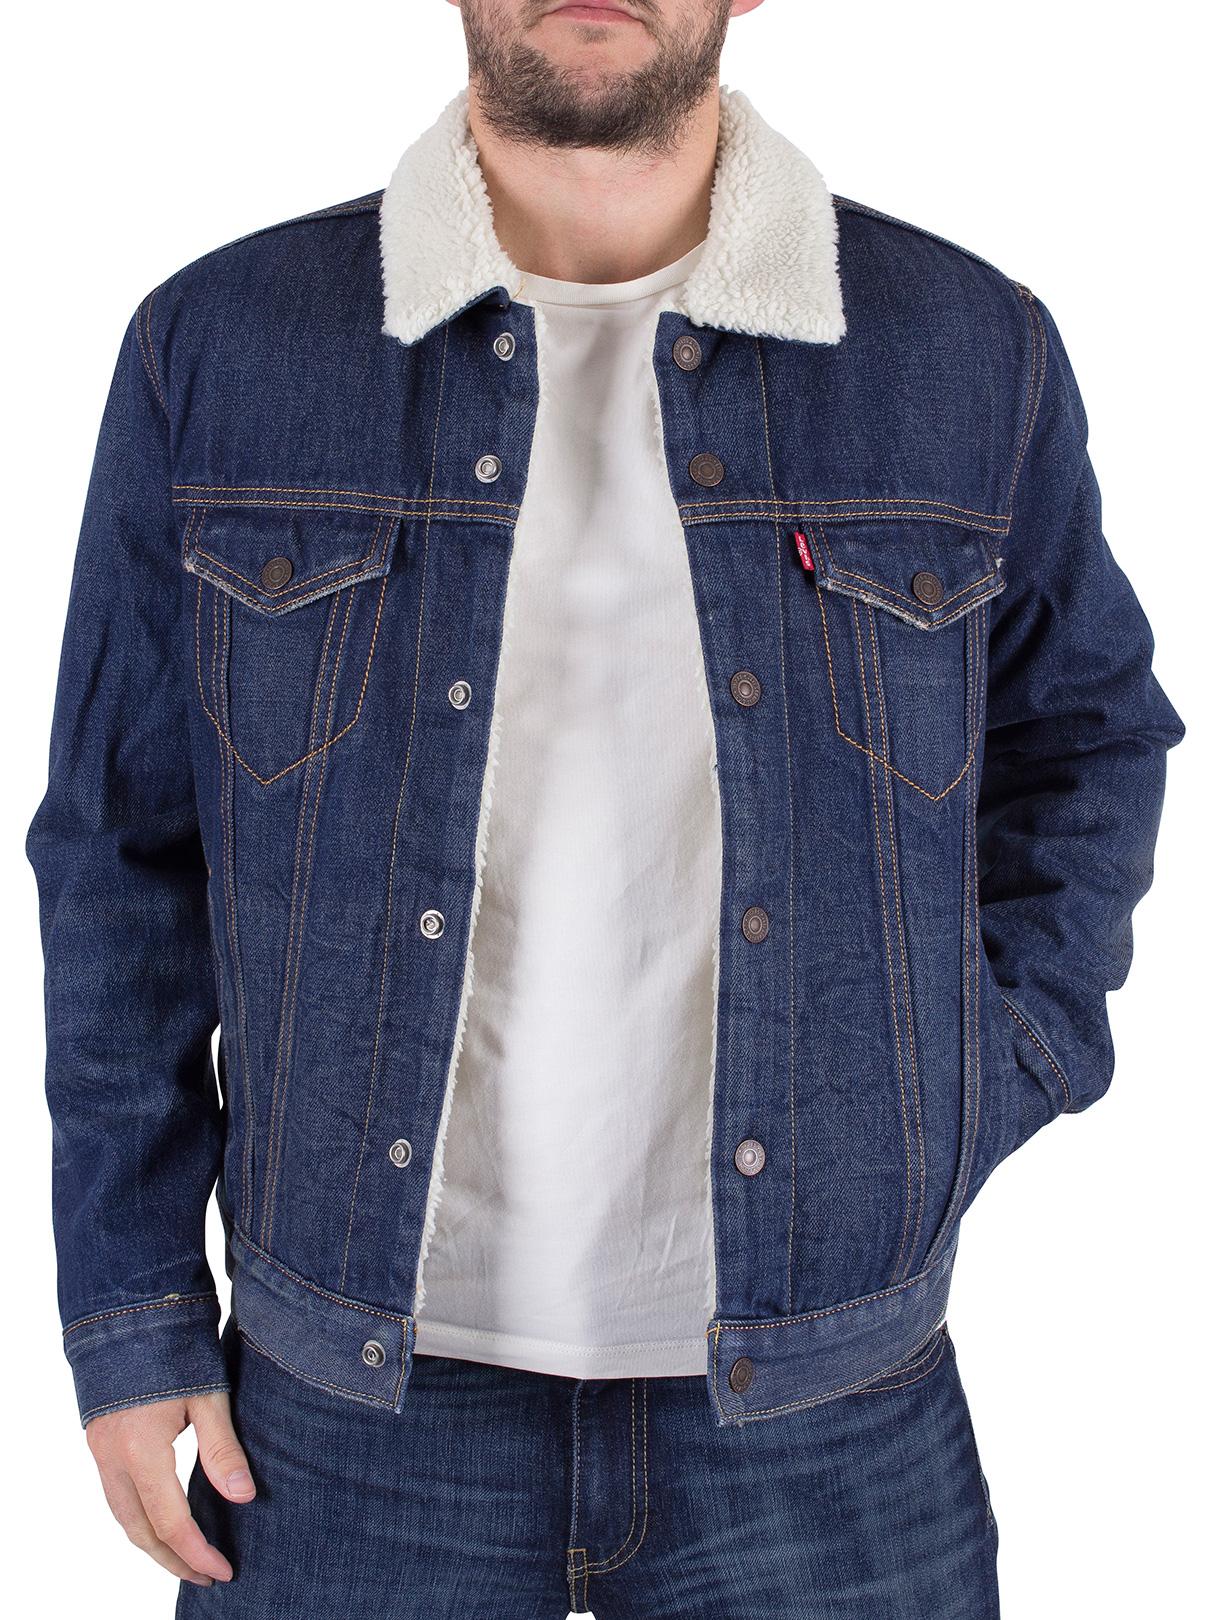 Levi's Men's Type 3 Lucky Town Sherpa Jacket, Blue